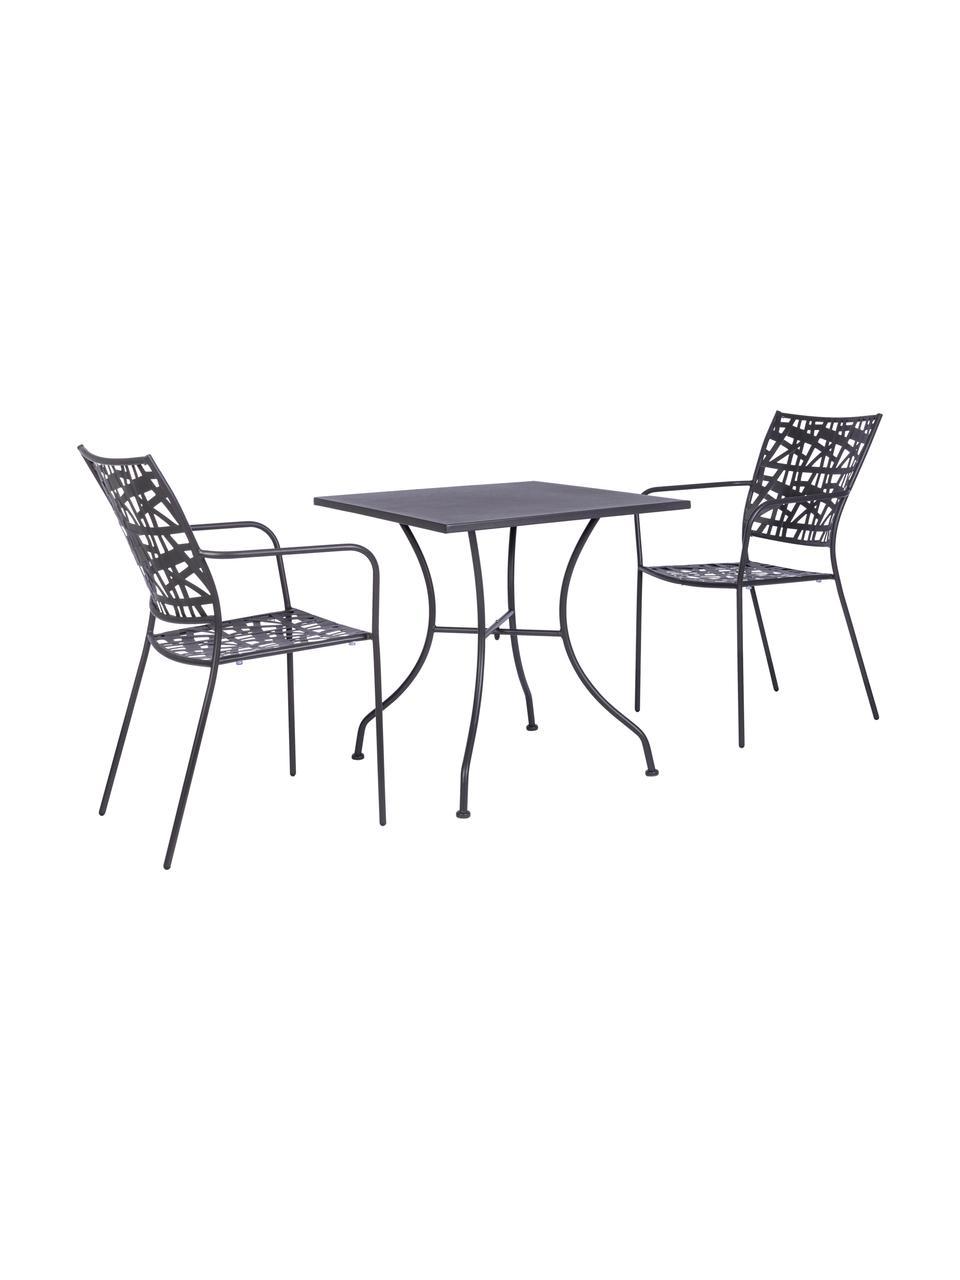 Sedia impilabile da giardino in metallo Kelsie, Metallo verniciato a polvere, Grigio, Larg. 55 x Prof. 54 cm